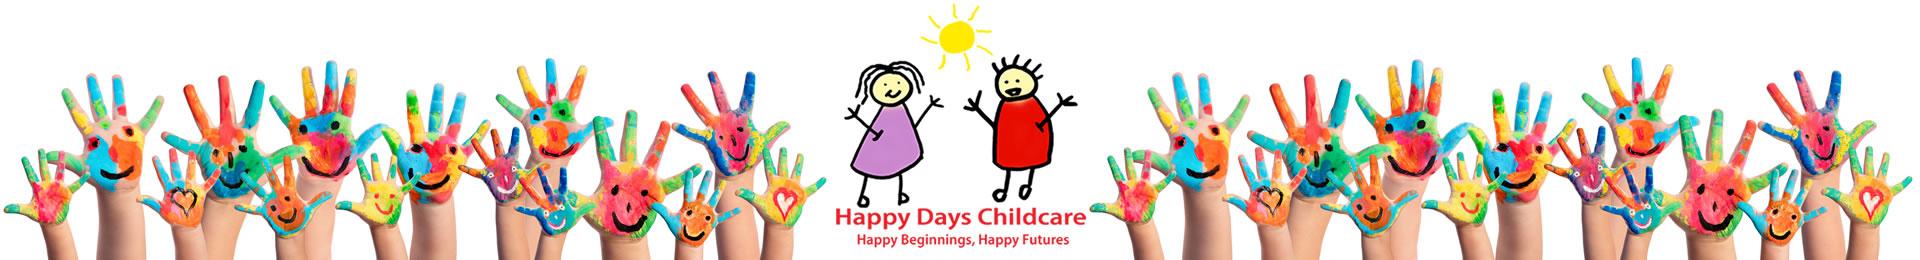 Happy Days Childcare Nursery based in Suffolk